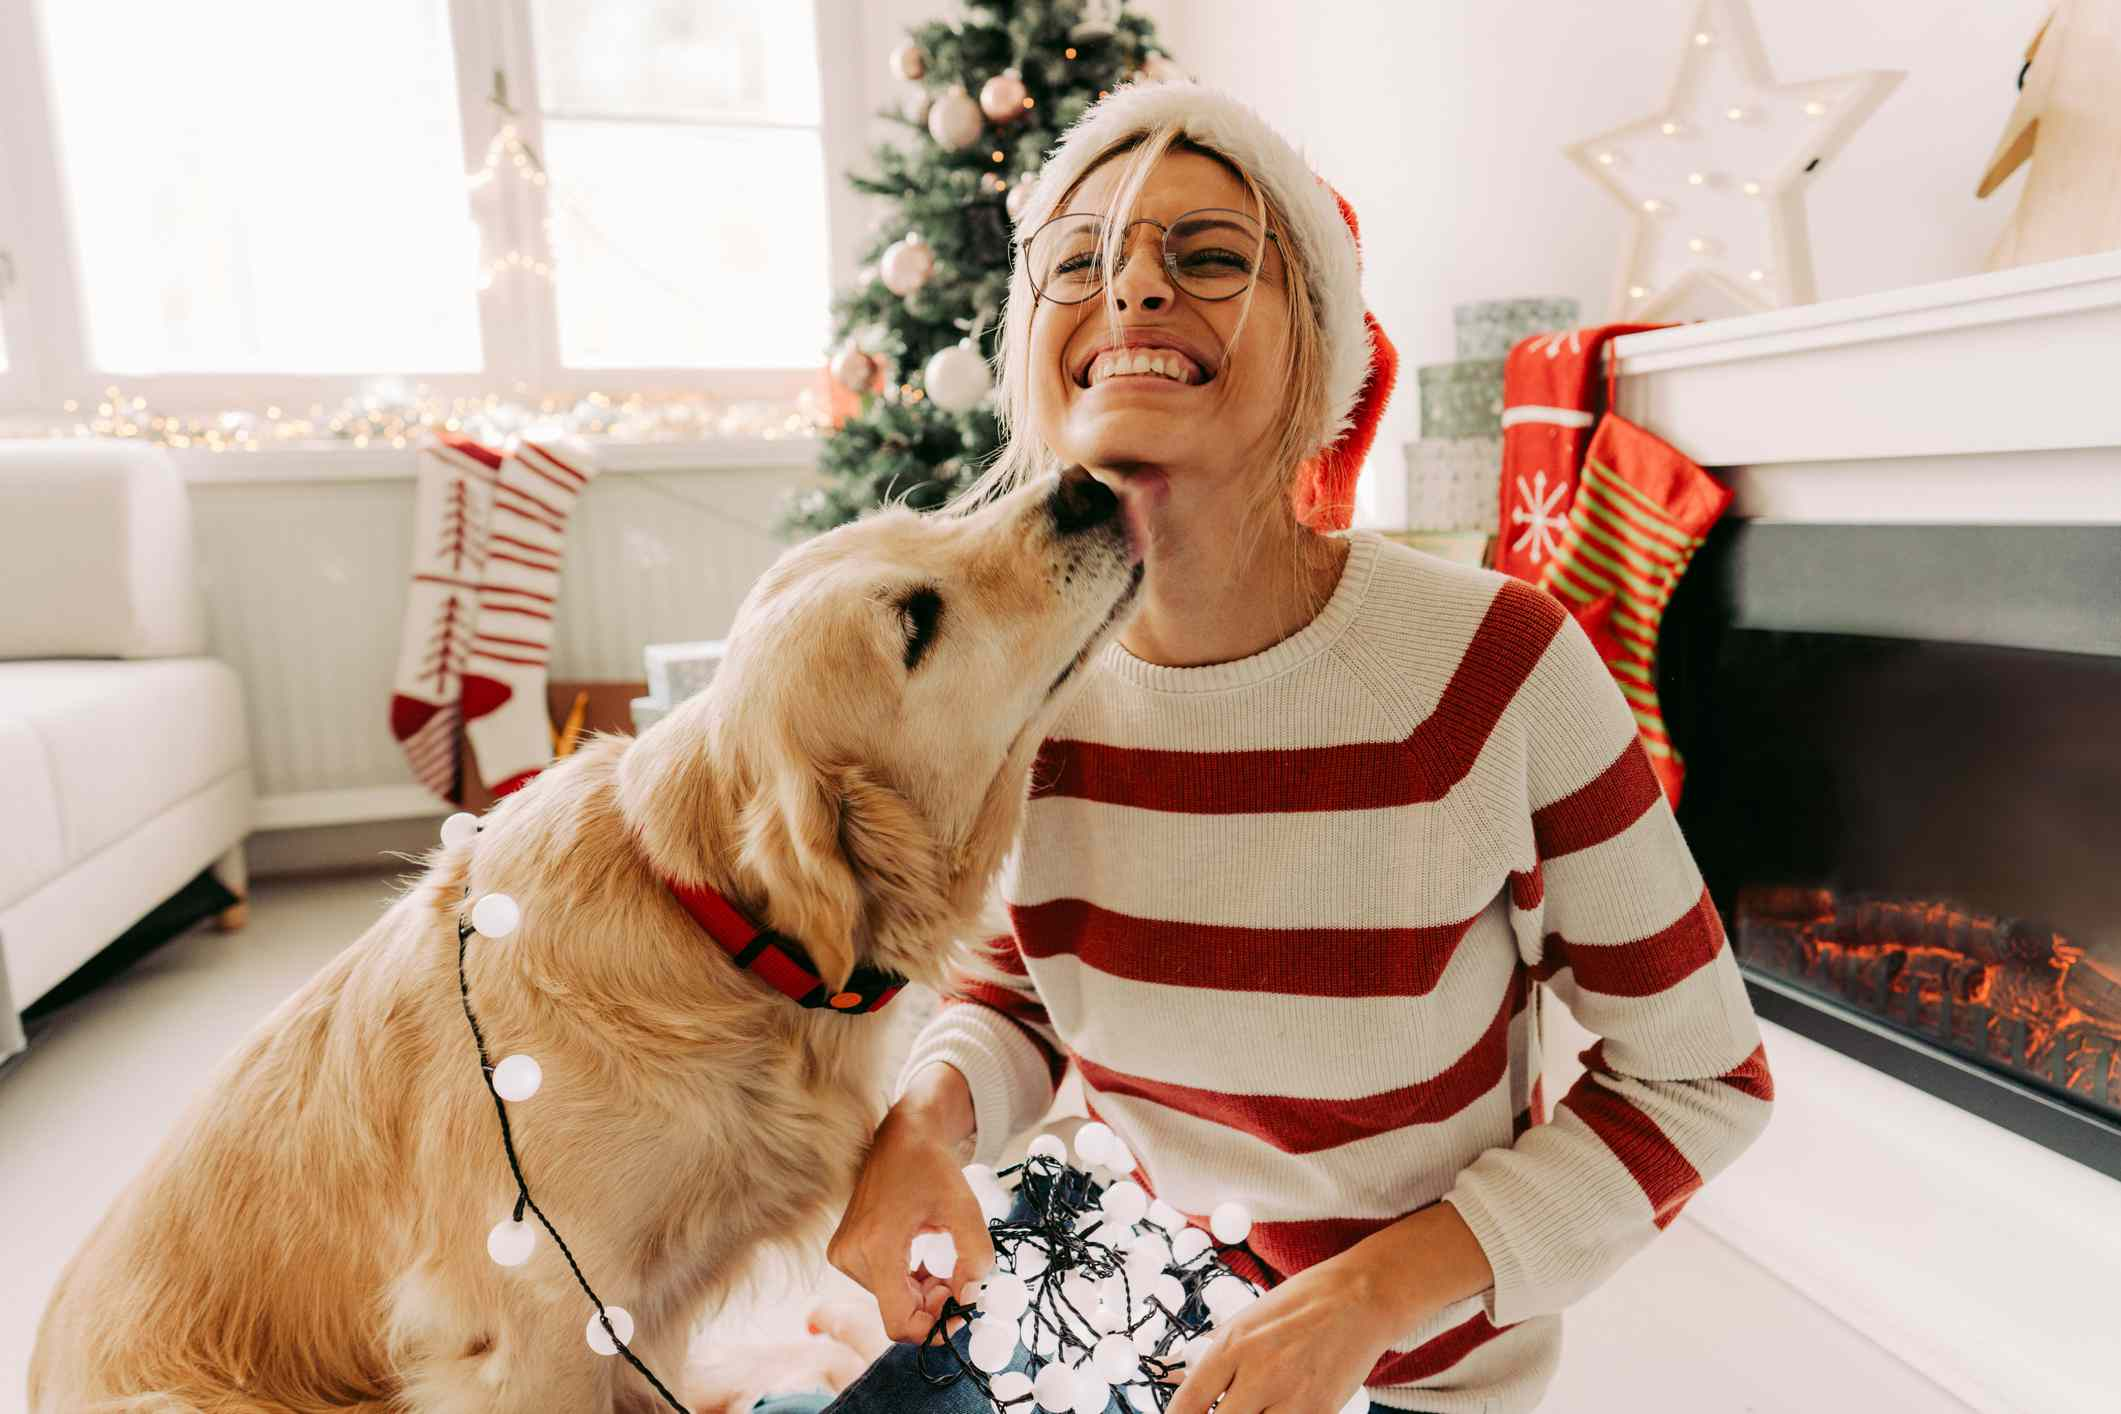 gift exchange ideas - dog and woman on christmas